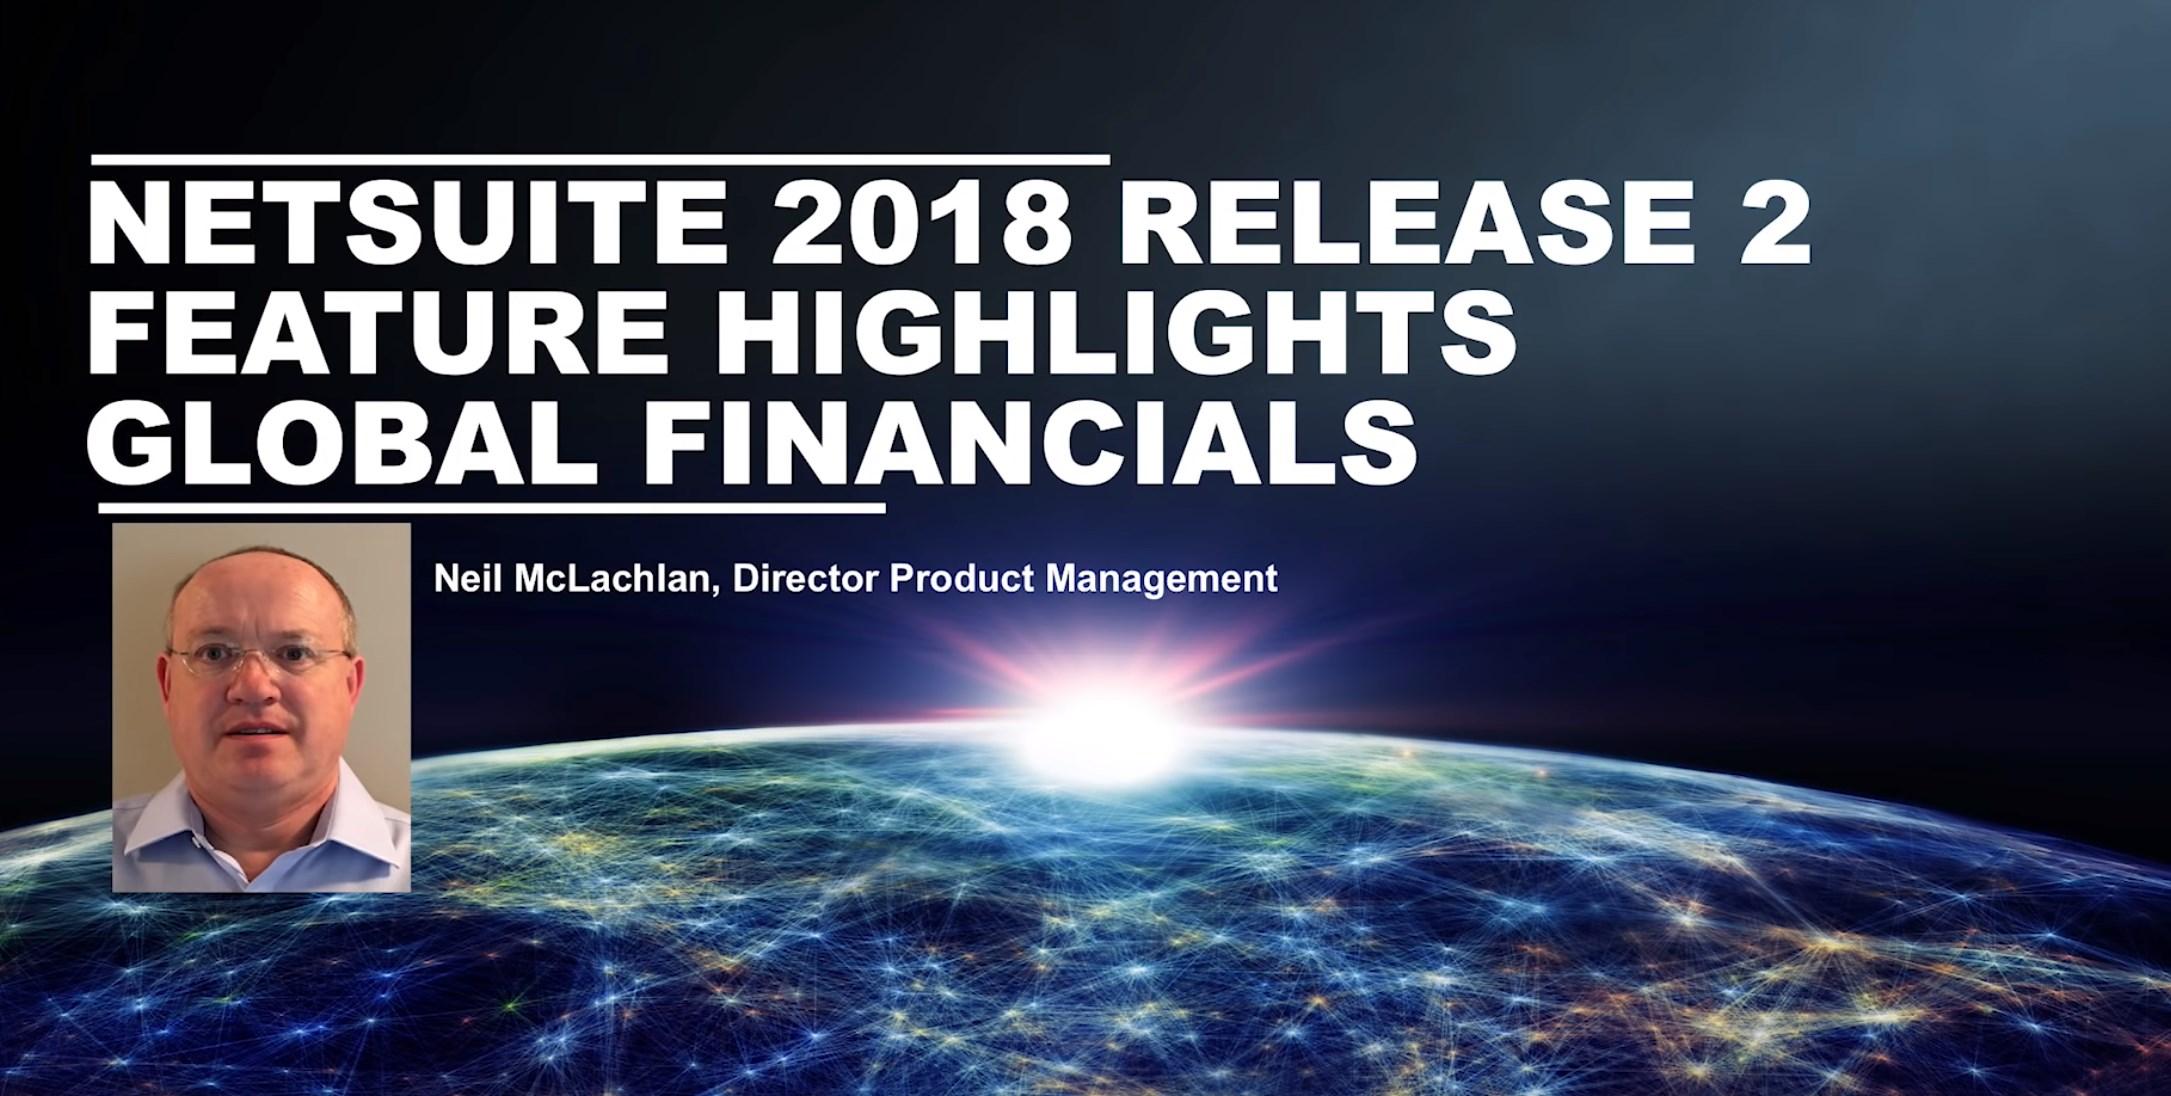 ns-sneakpeek-global-financials